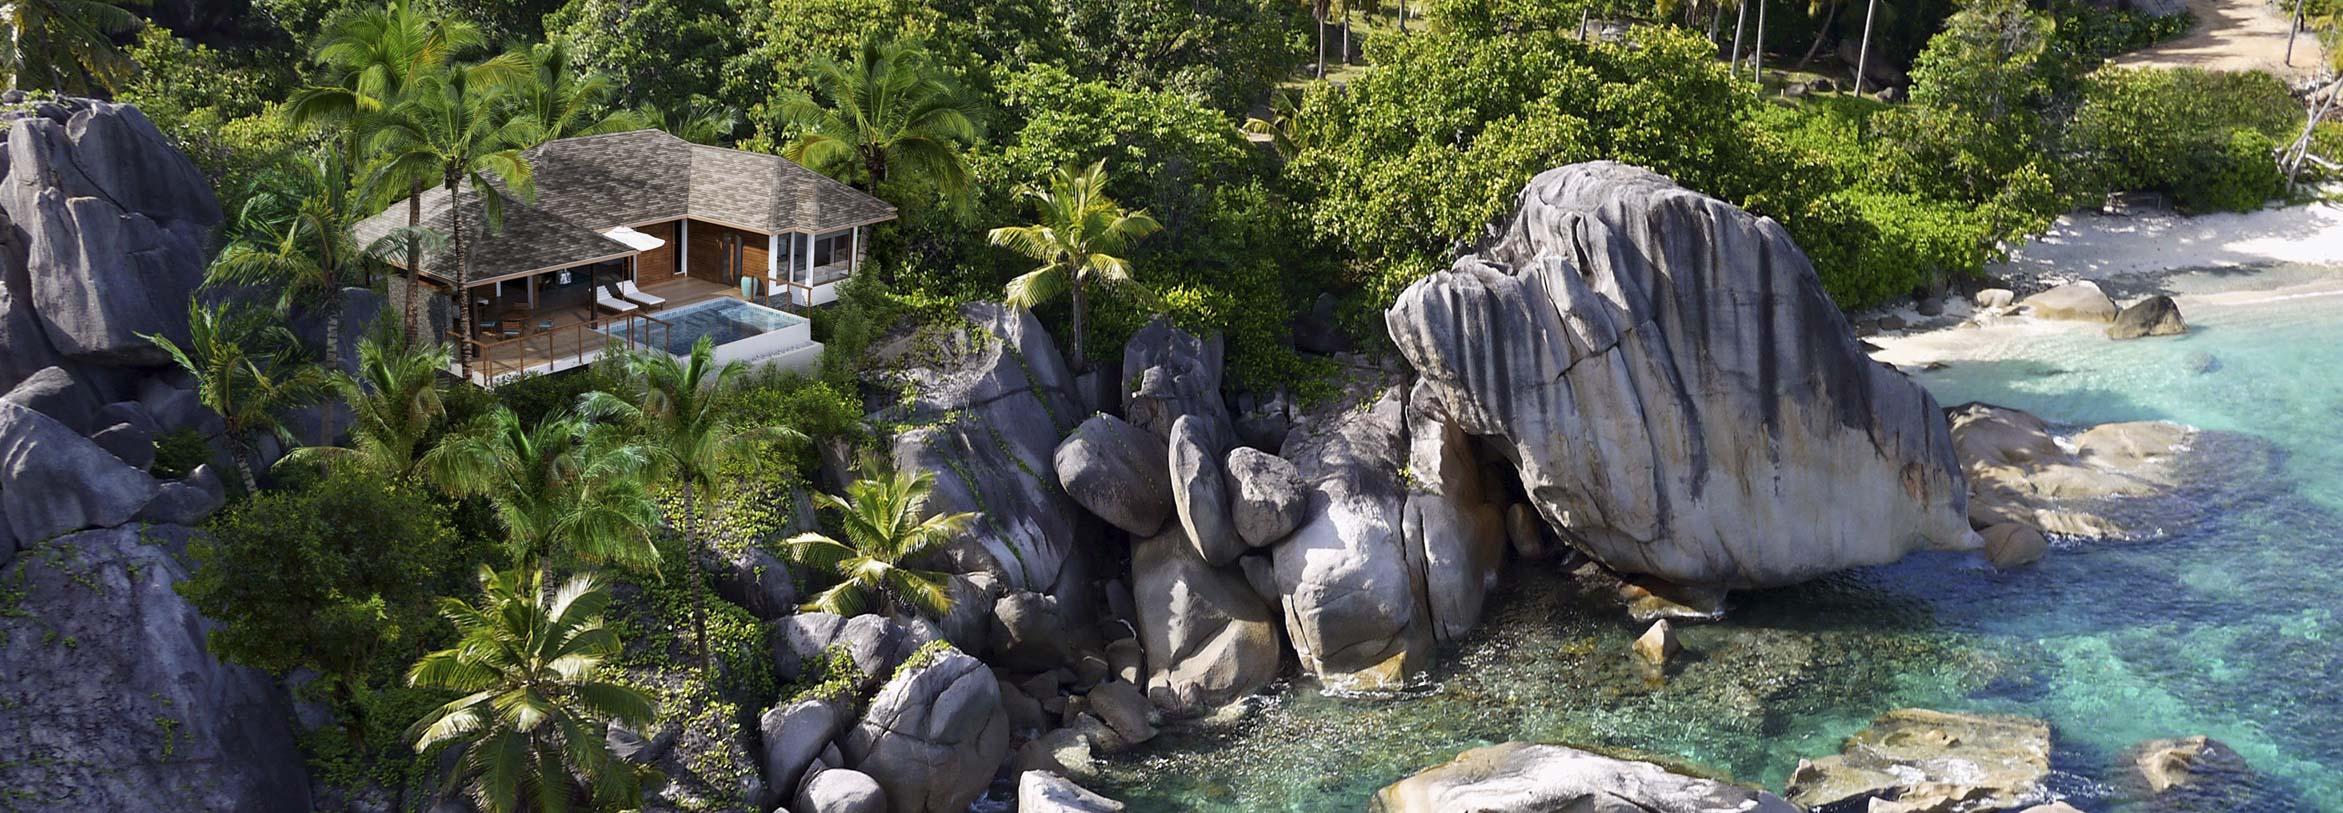 Luxury Escapes at Six Senses Zil Pasyon Seychelles - Lavish Hotels and Resorts